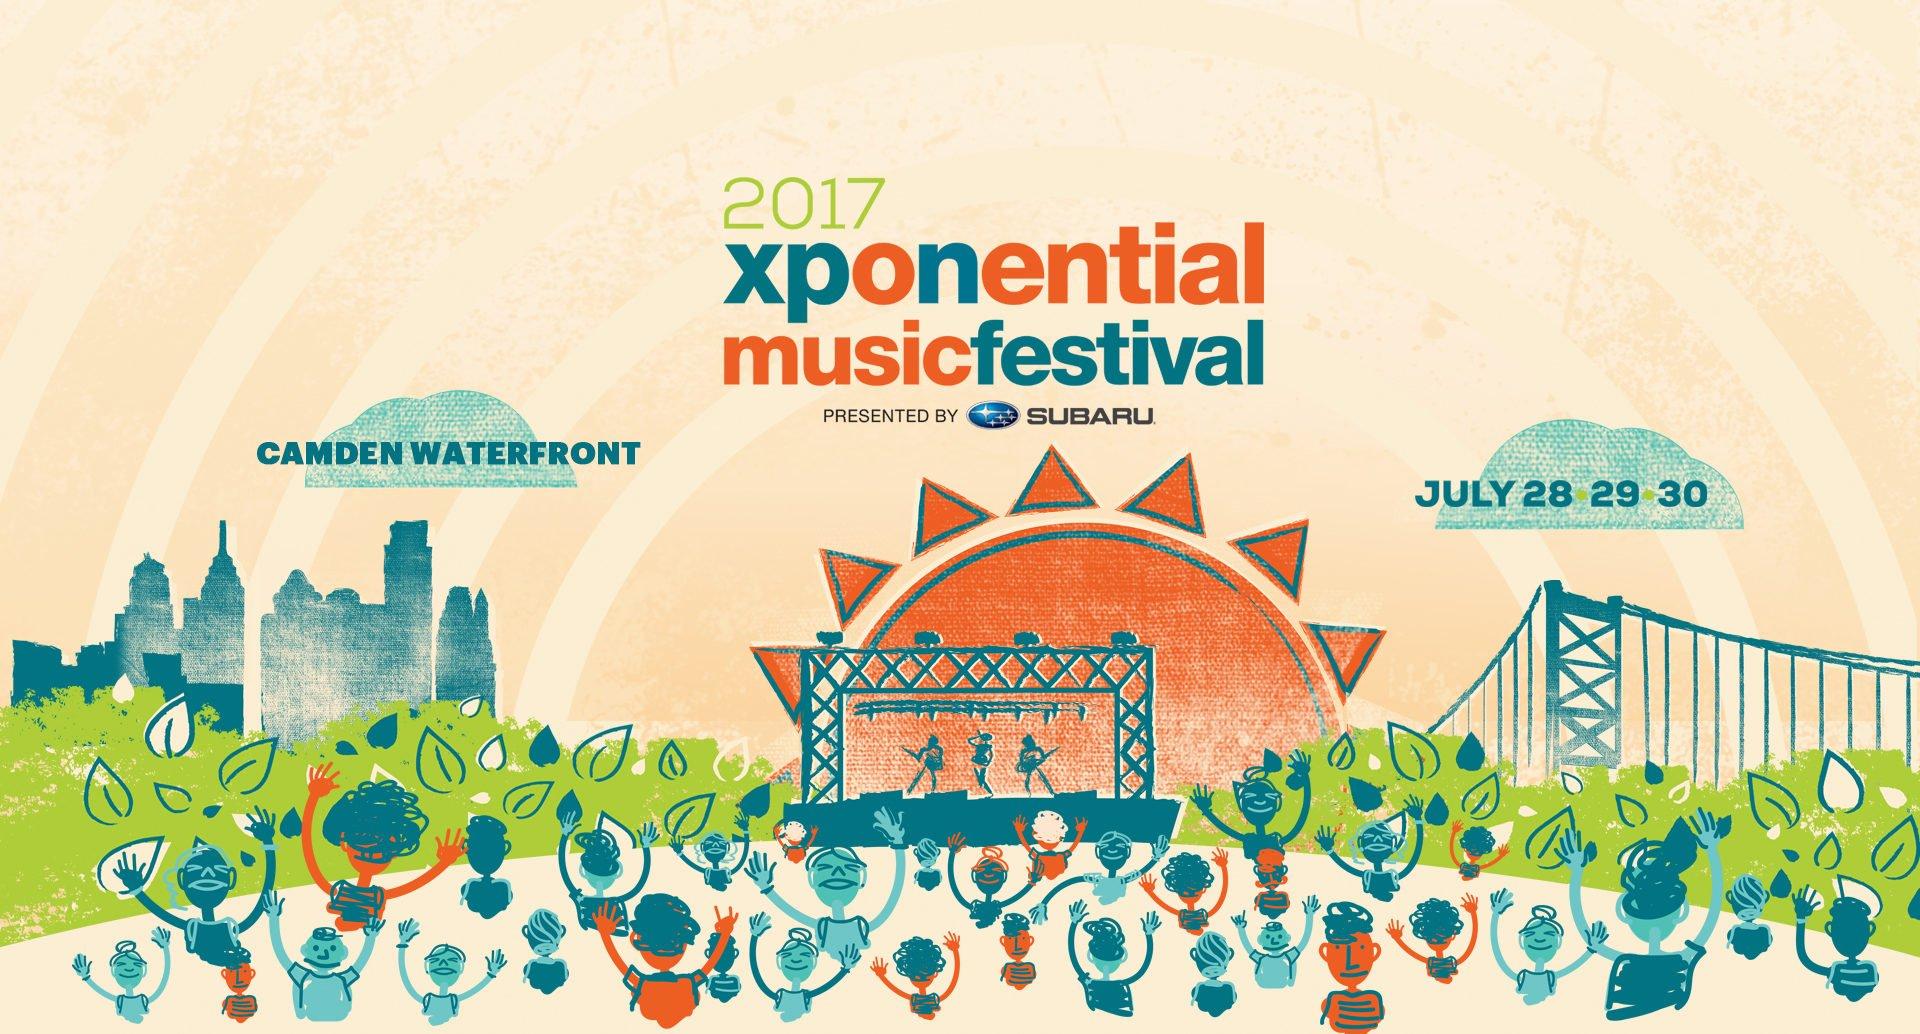 WXPN 2017 Xponential Music Festival